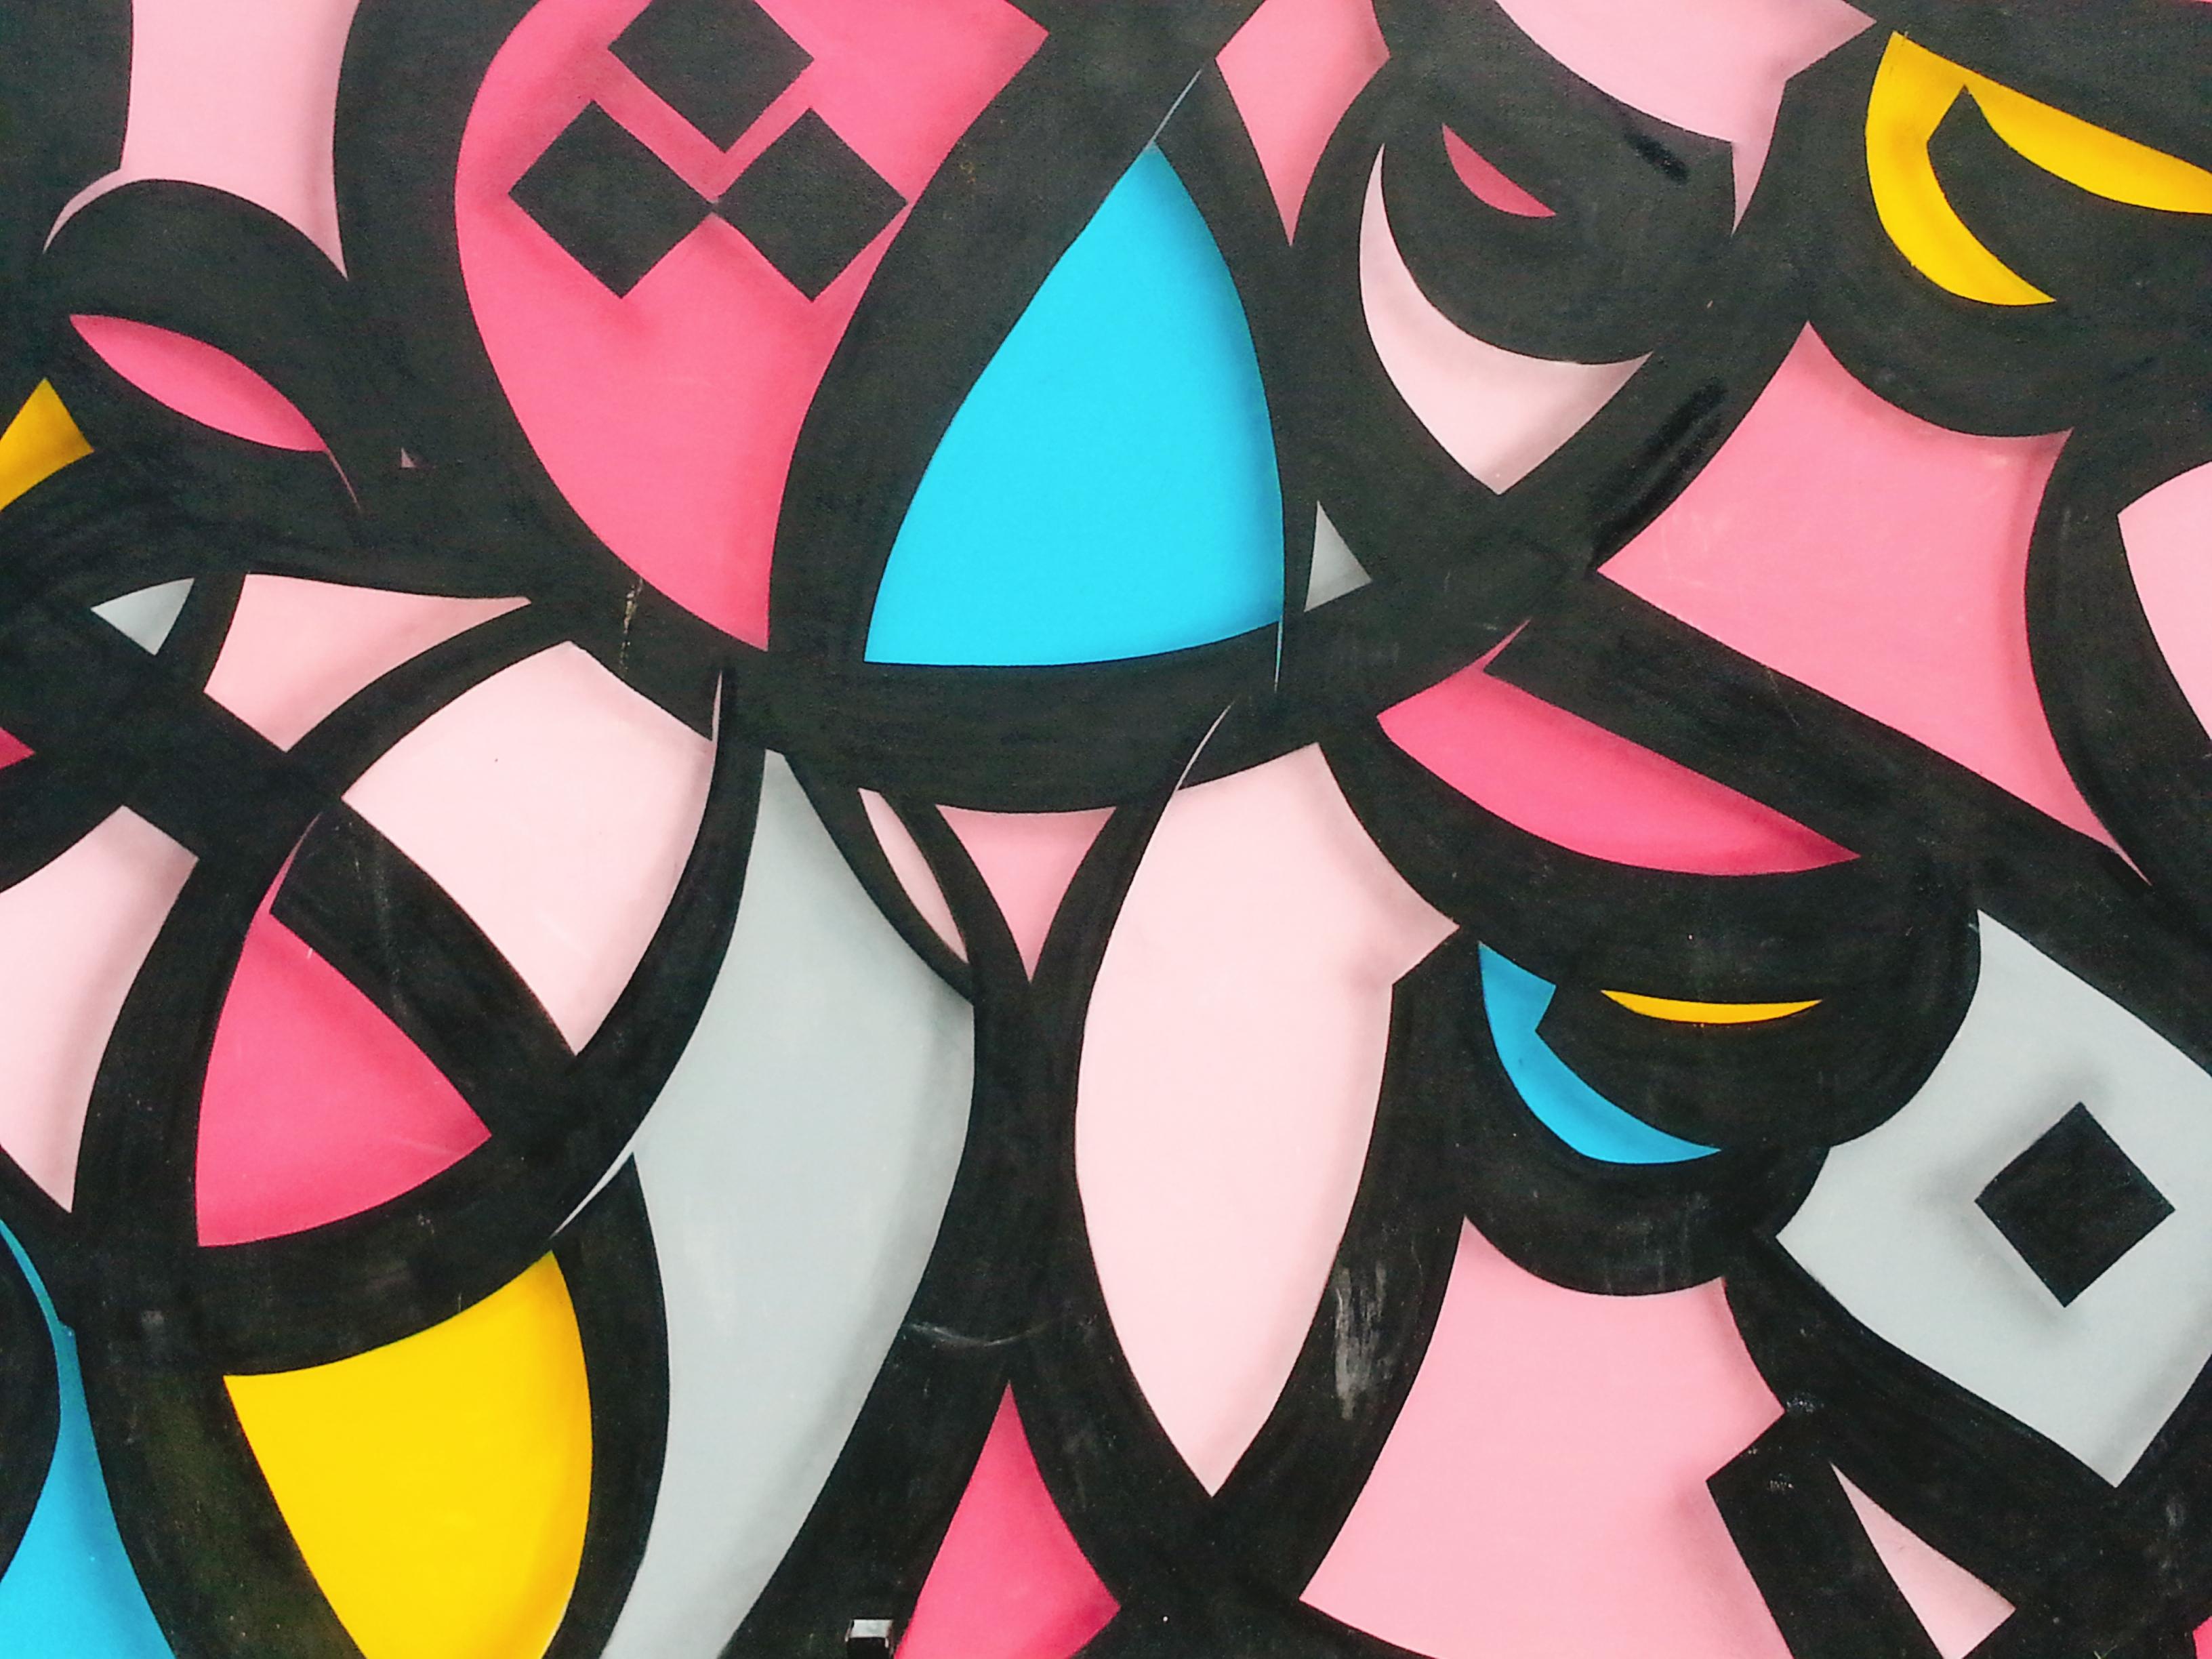 el seed graffiti art wynwood